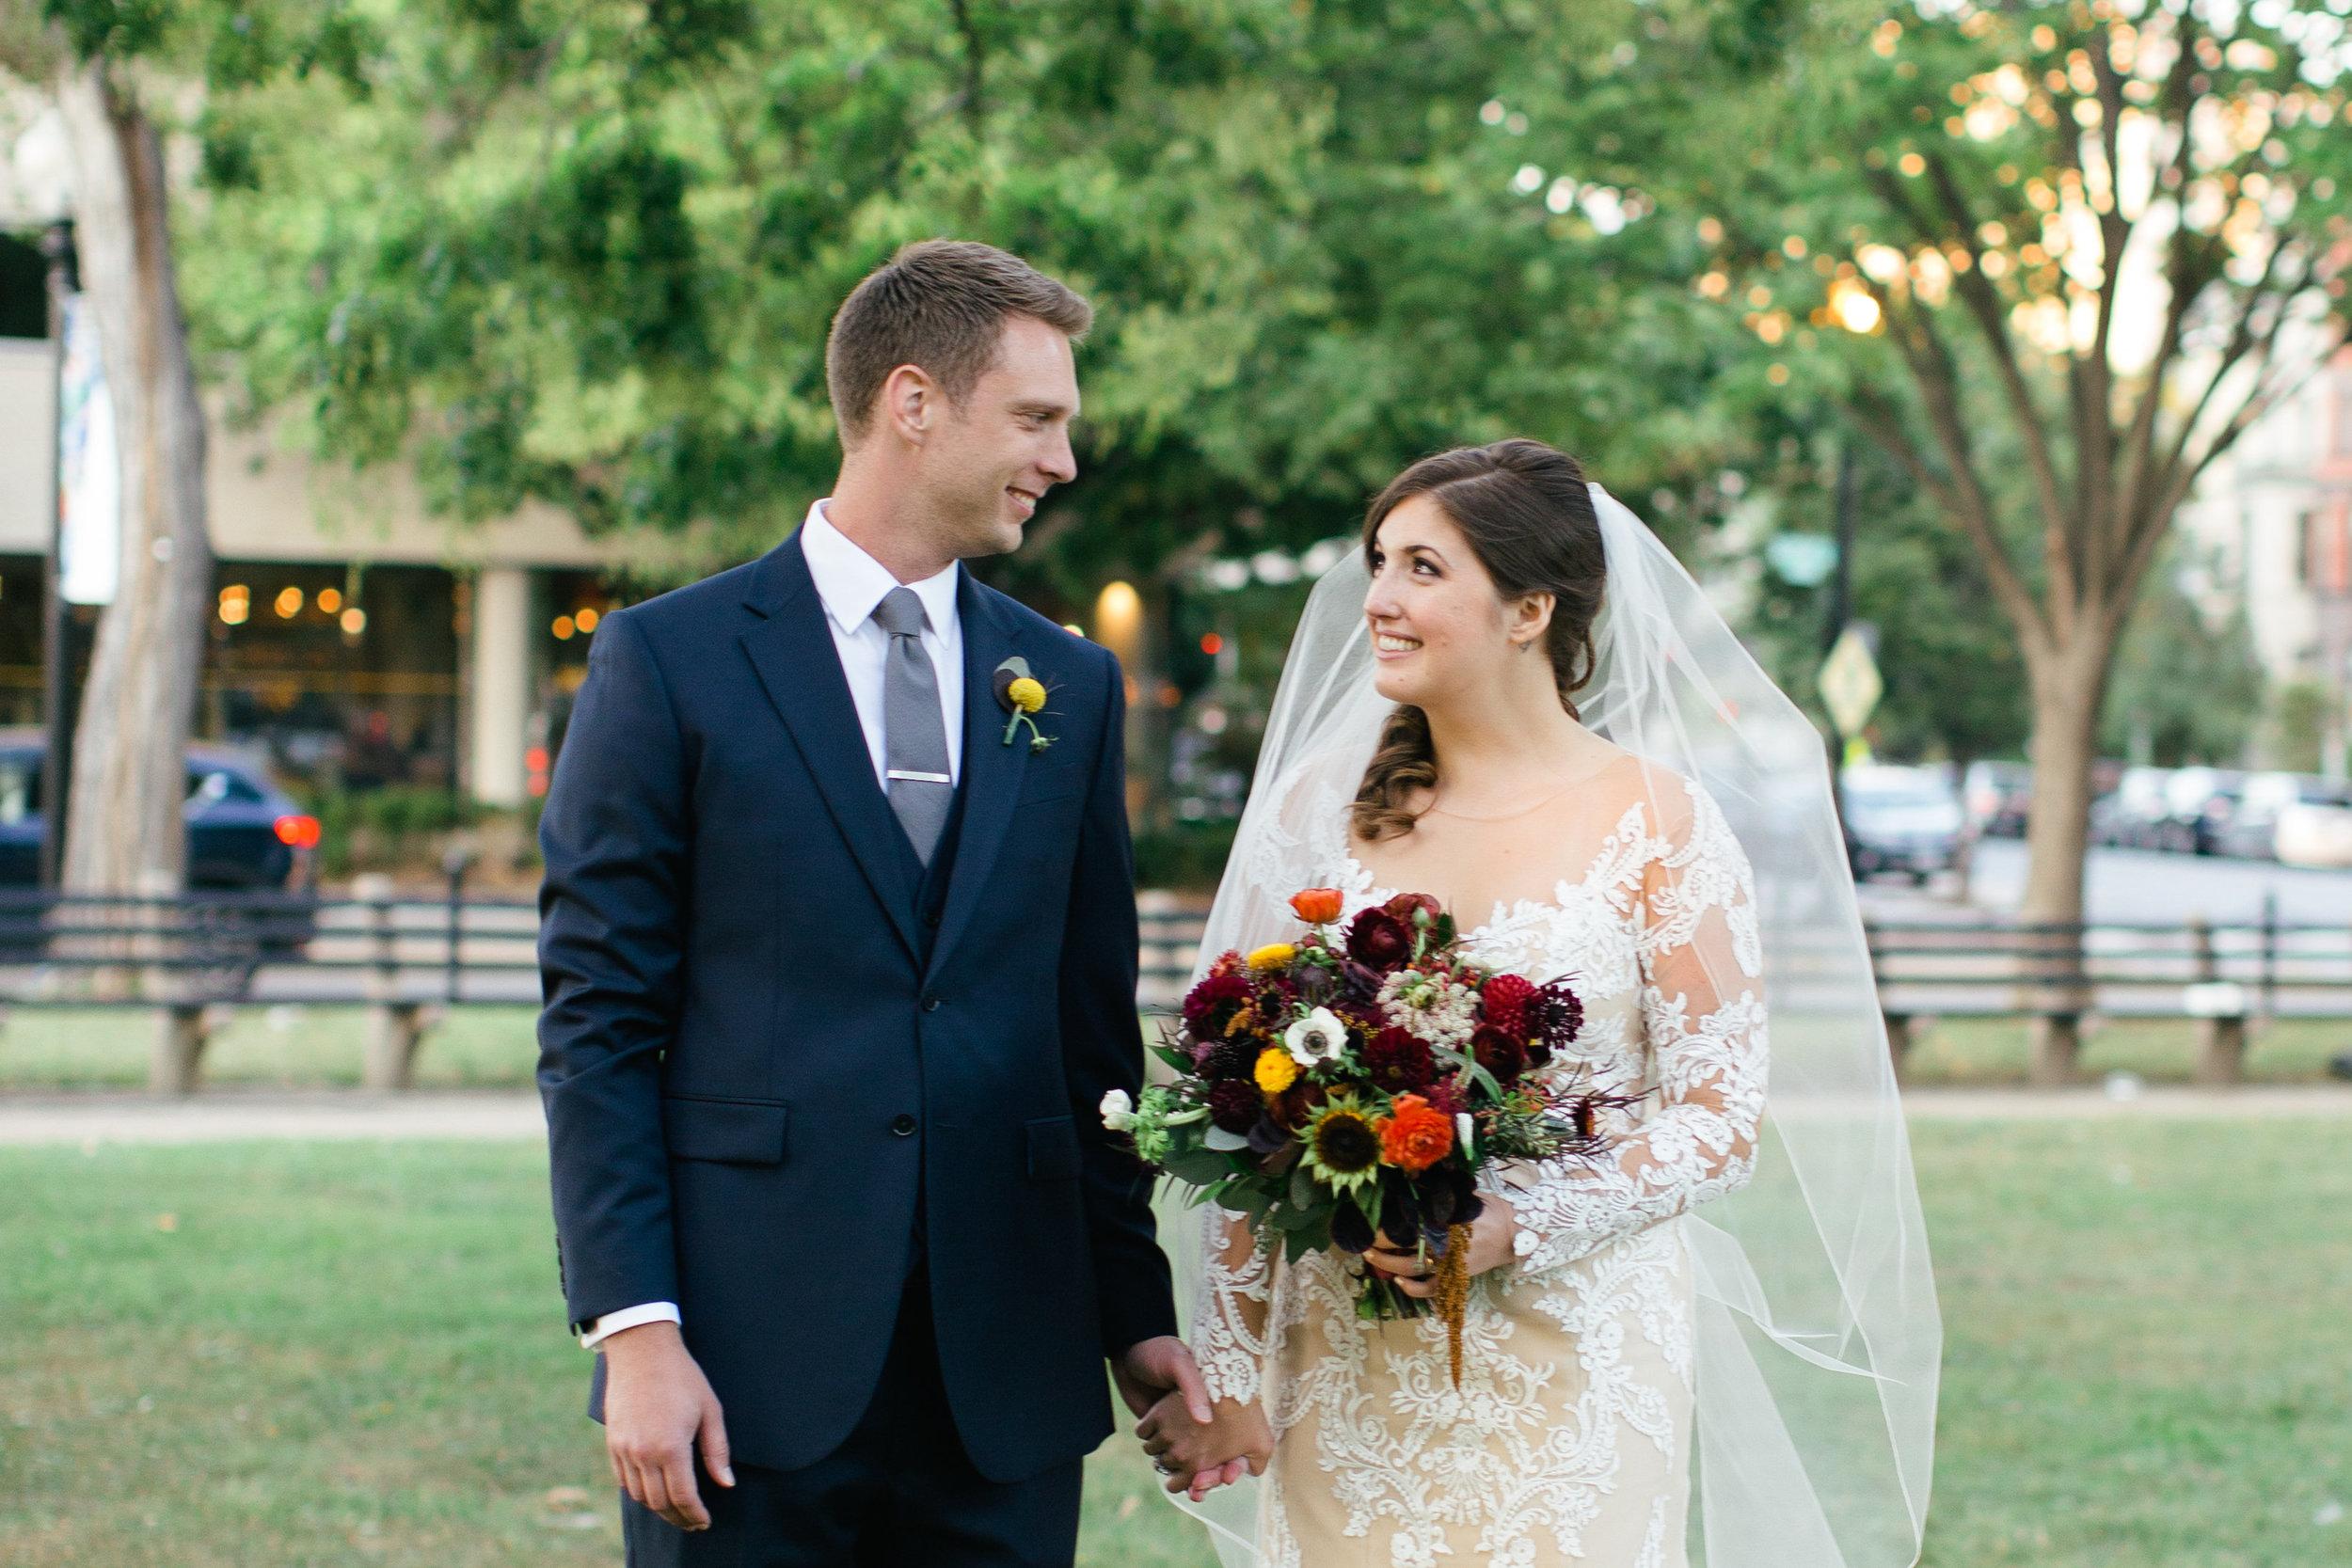 Dupon Circle Wedding | Washington DC Wedding Photography | Rebecca Wilcher Photography -20.jpg